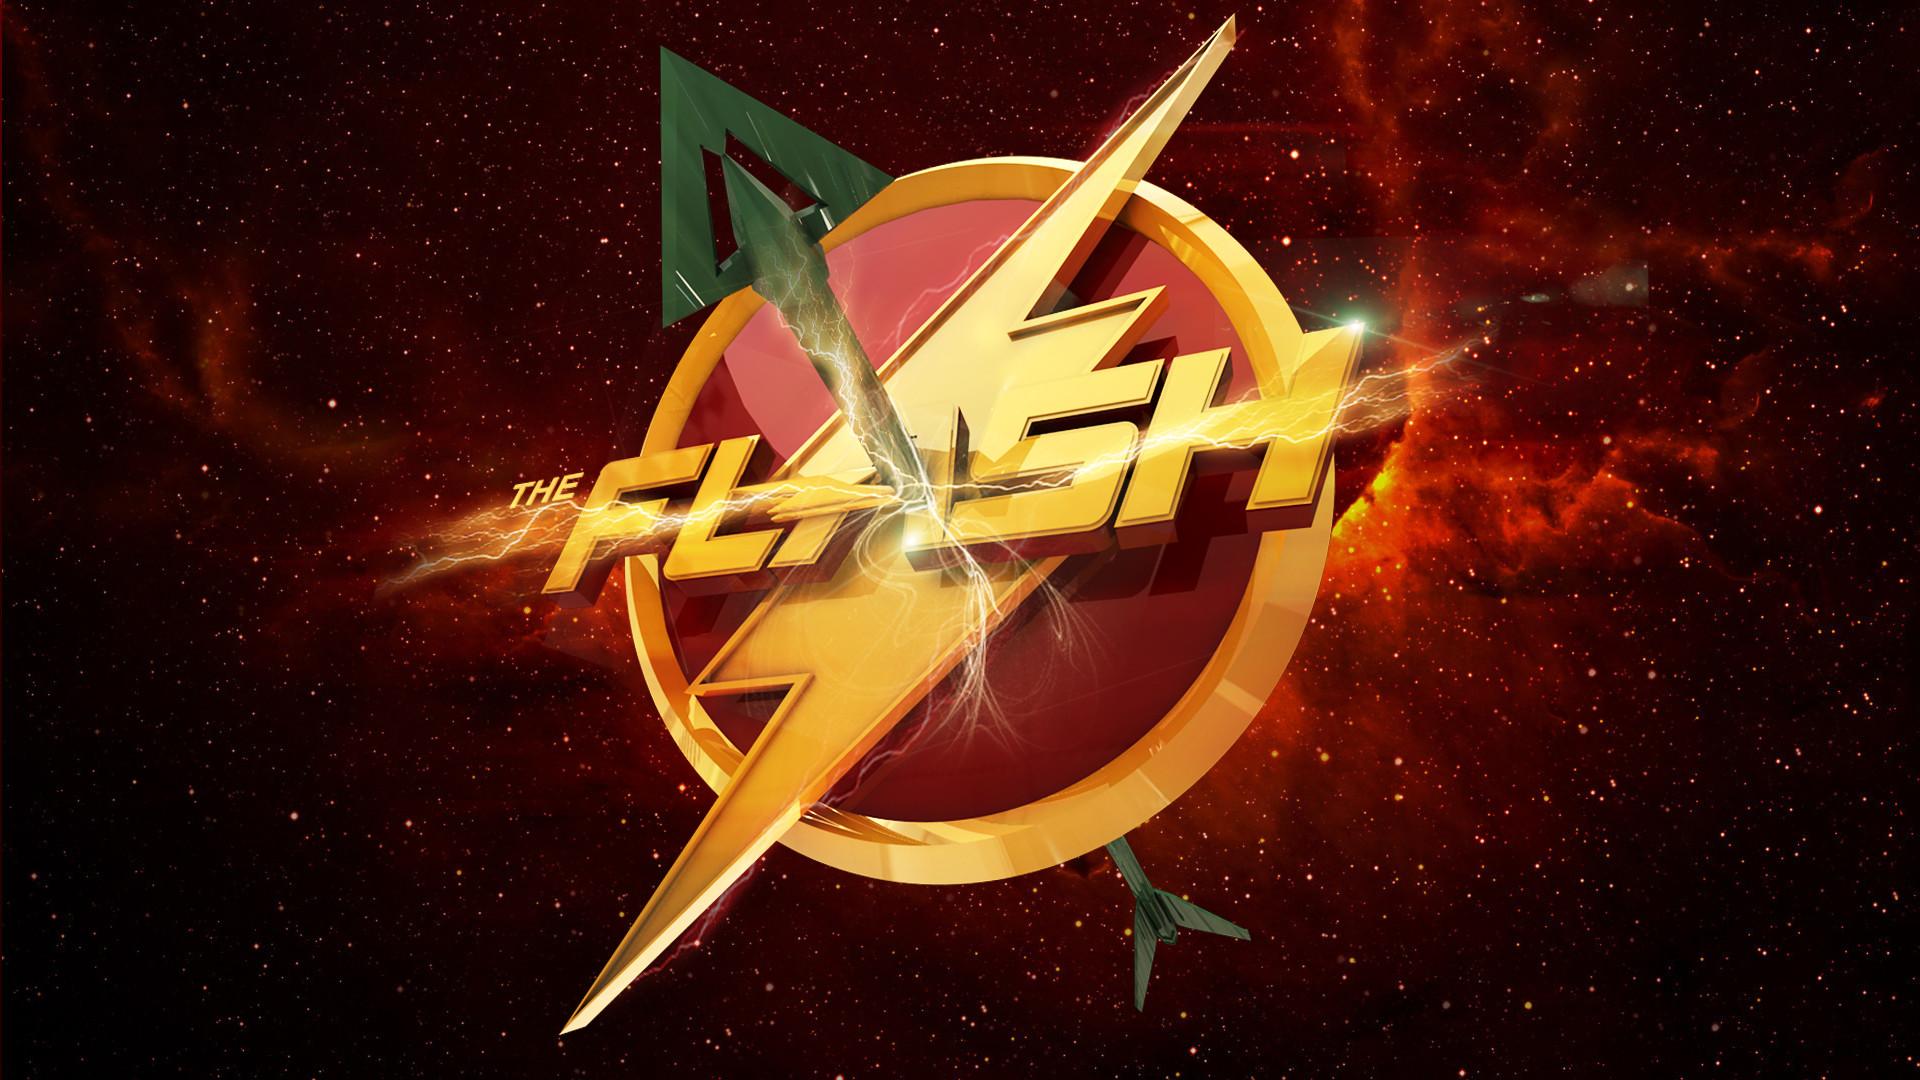 Arrow and Flash HD Wallpaper